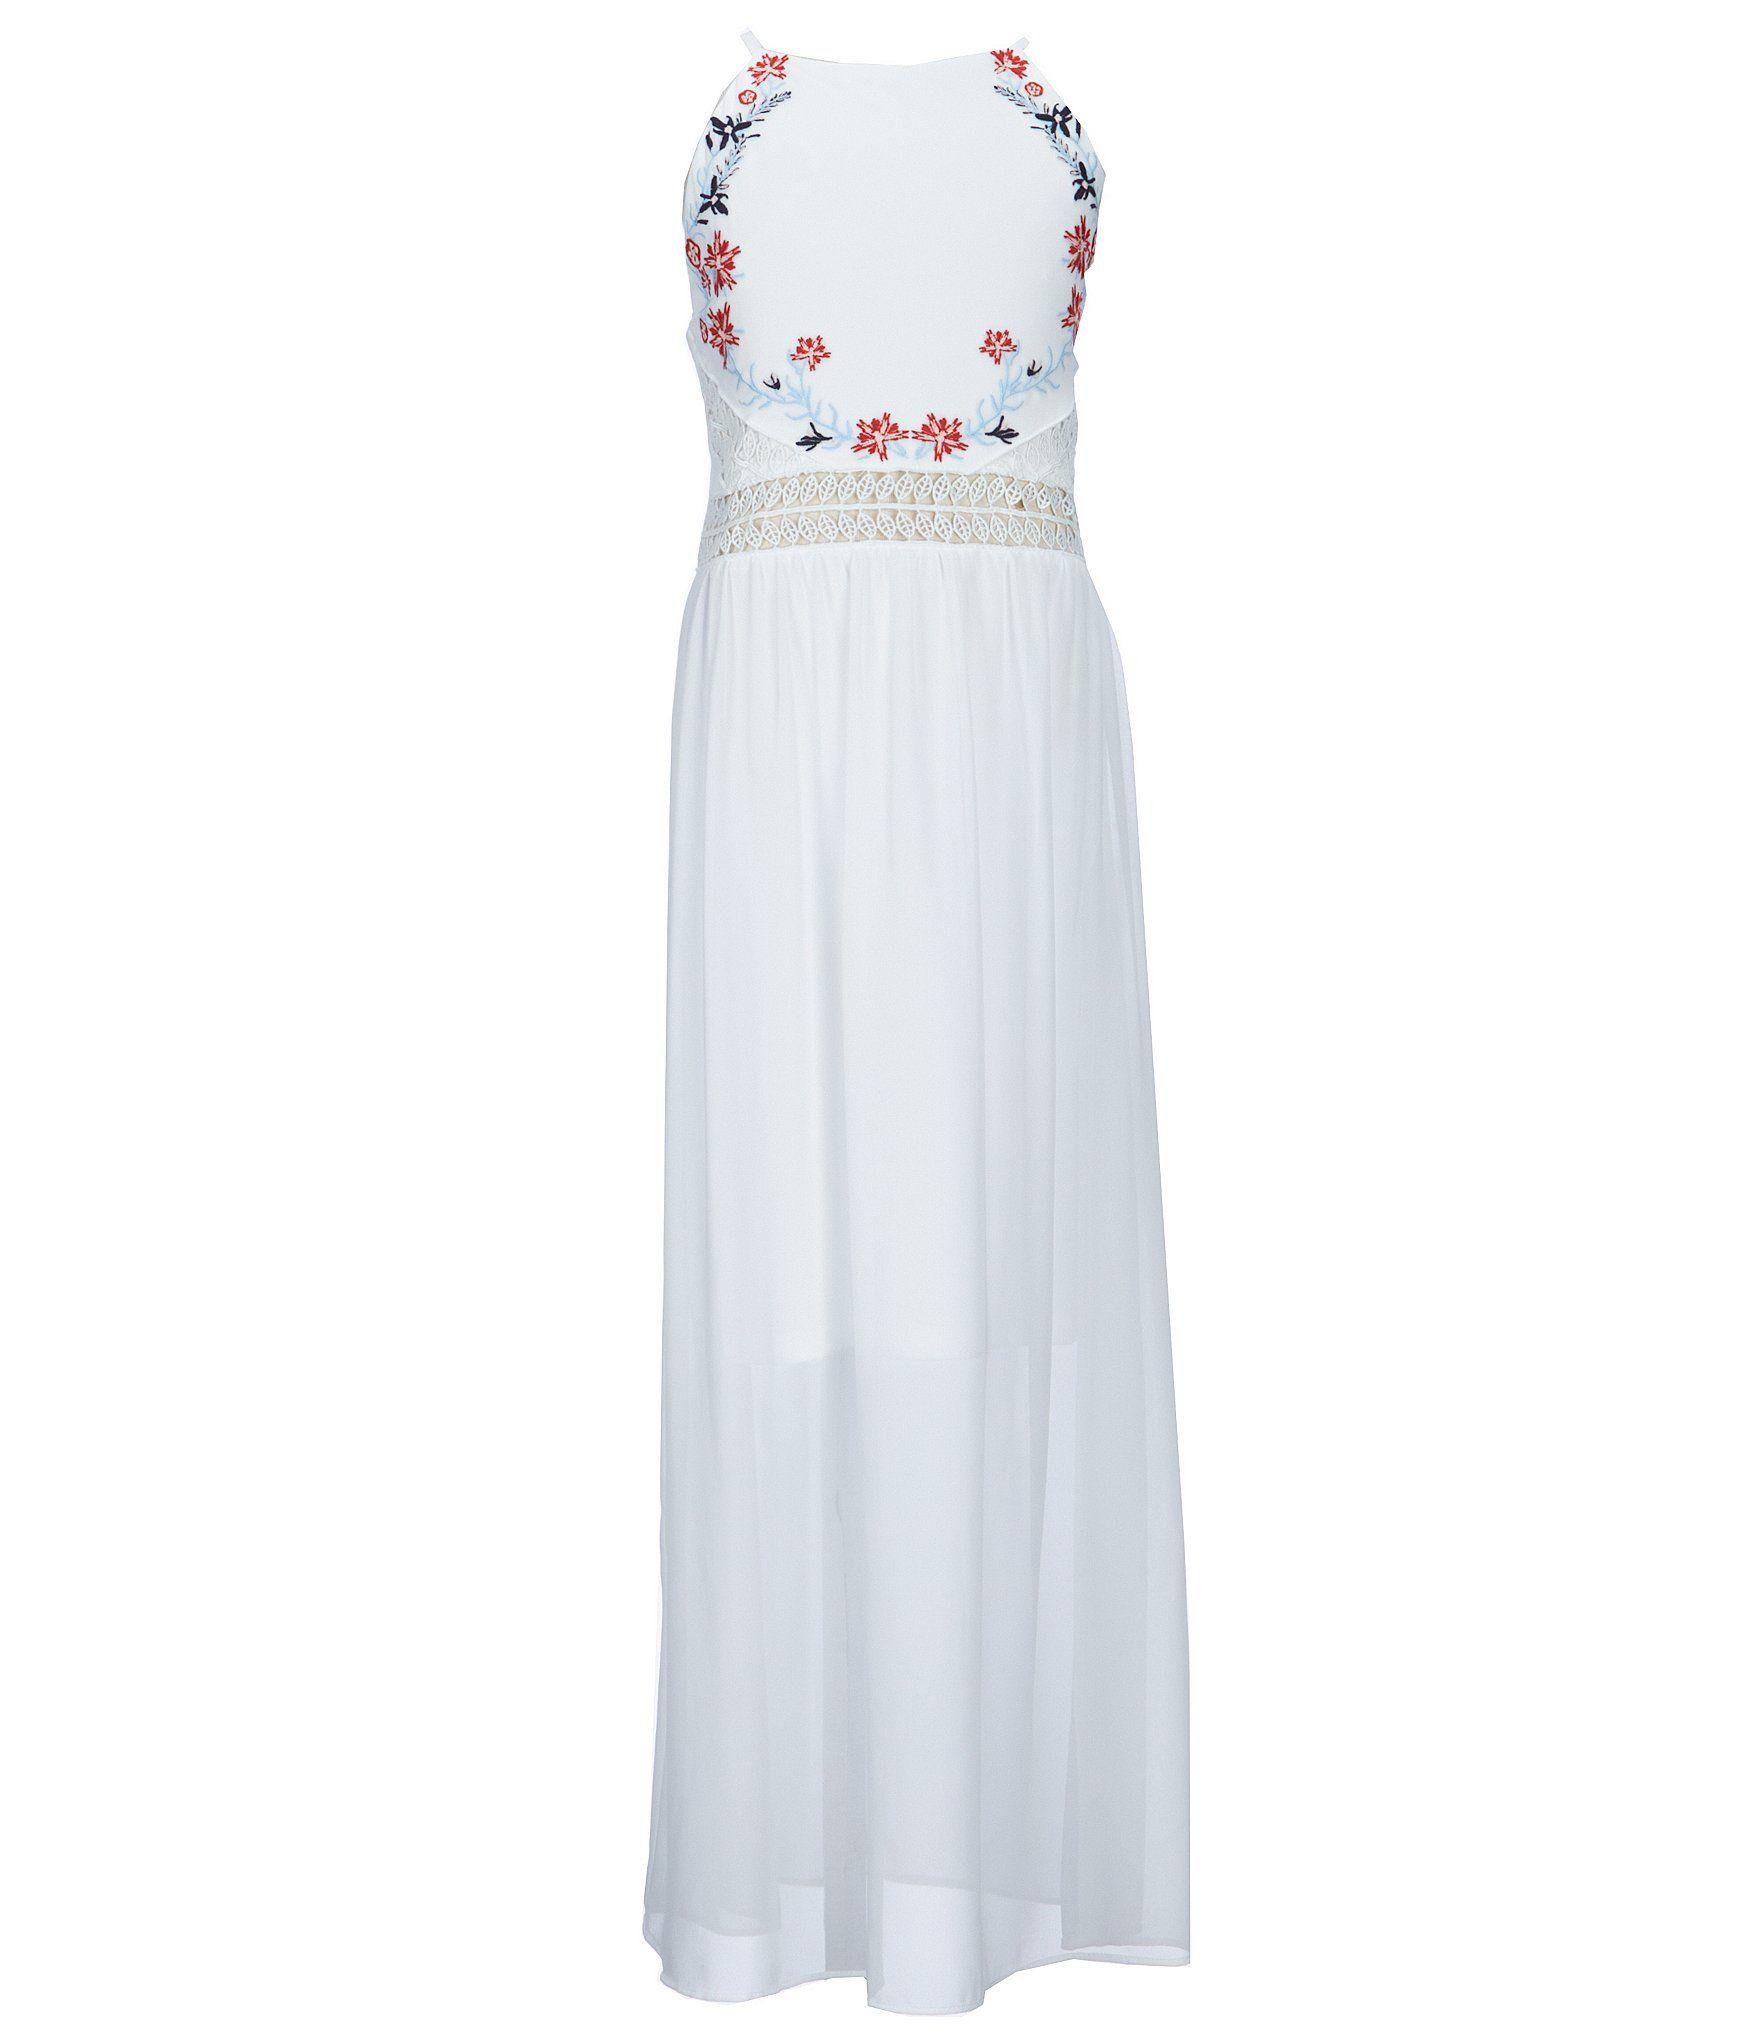 6640cb10bb7e Shop for I.N. Girl Big Girls 7-16 Embroidered Long Dress at Dillards.com. Visit  Dillards.com to find clothing